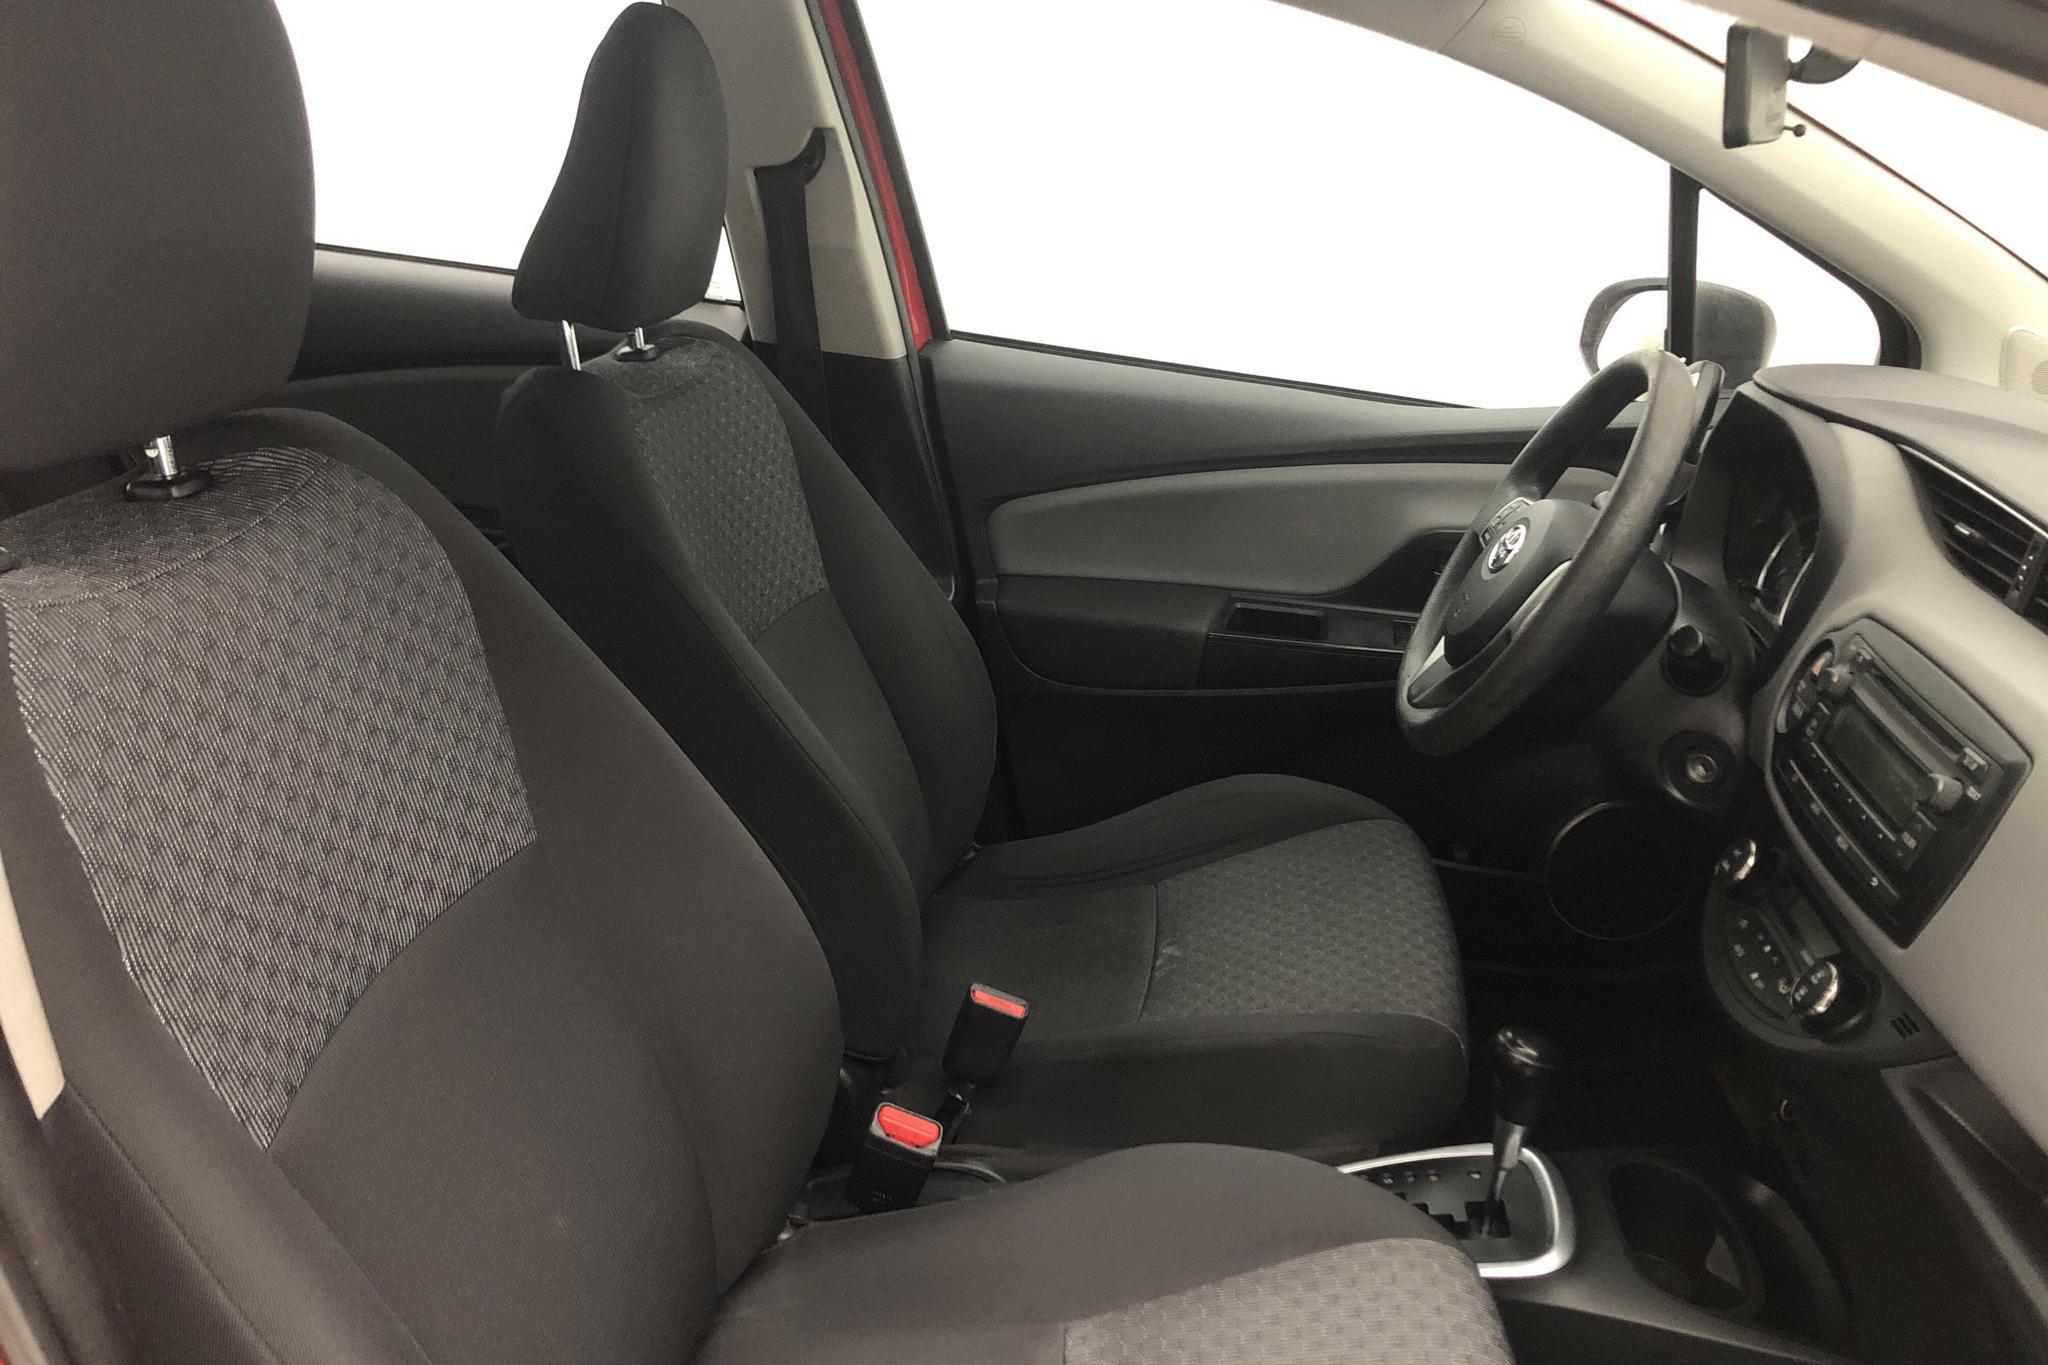 Toyota Yaris 1.5 HSD 5dr (75hk) - 13 336 mil - Automat - röd - 2015